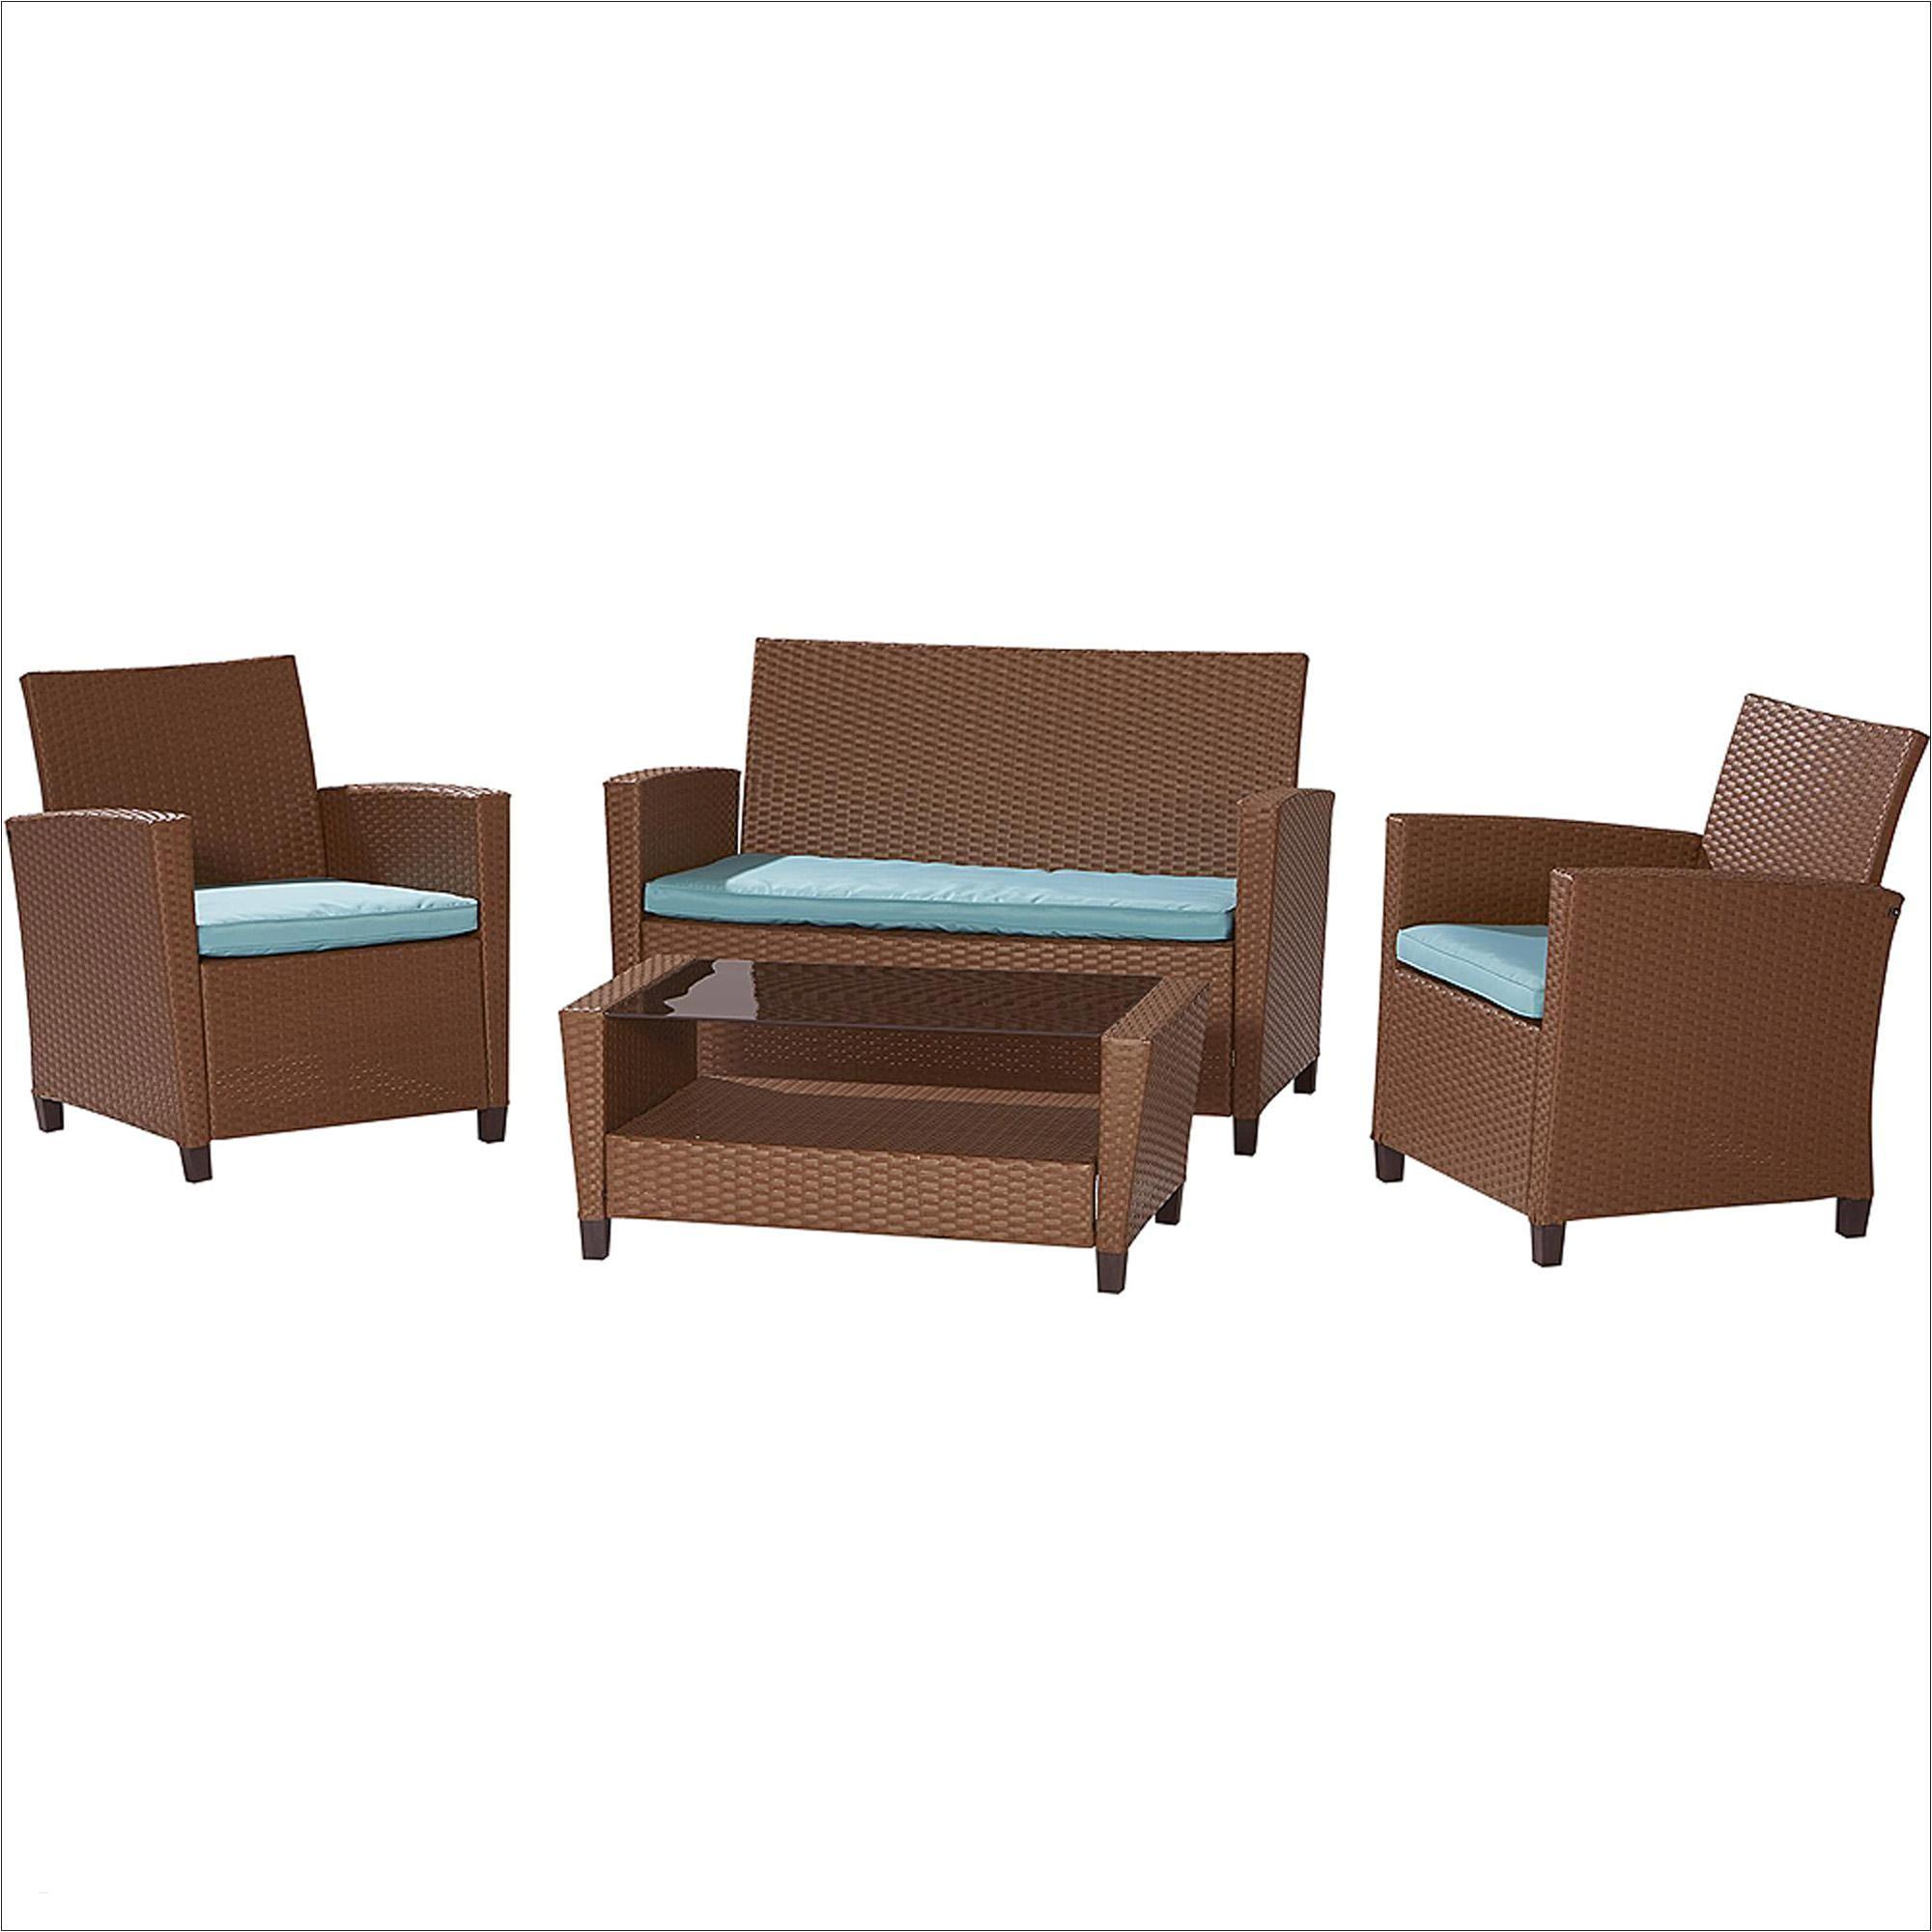 Bjs Sofa Sleeper Costco Outdoor Patio Furniture Luxury